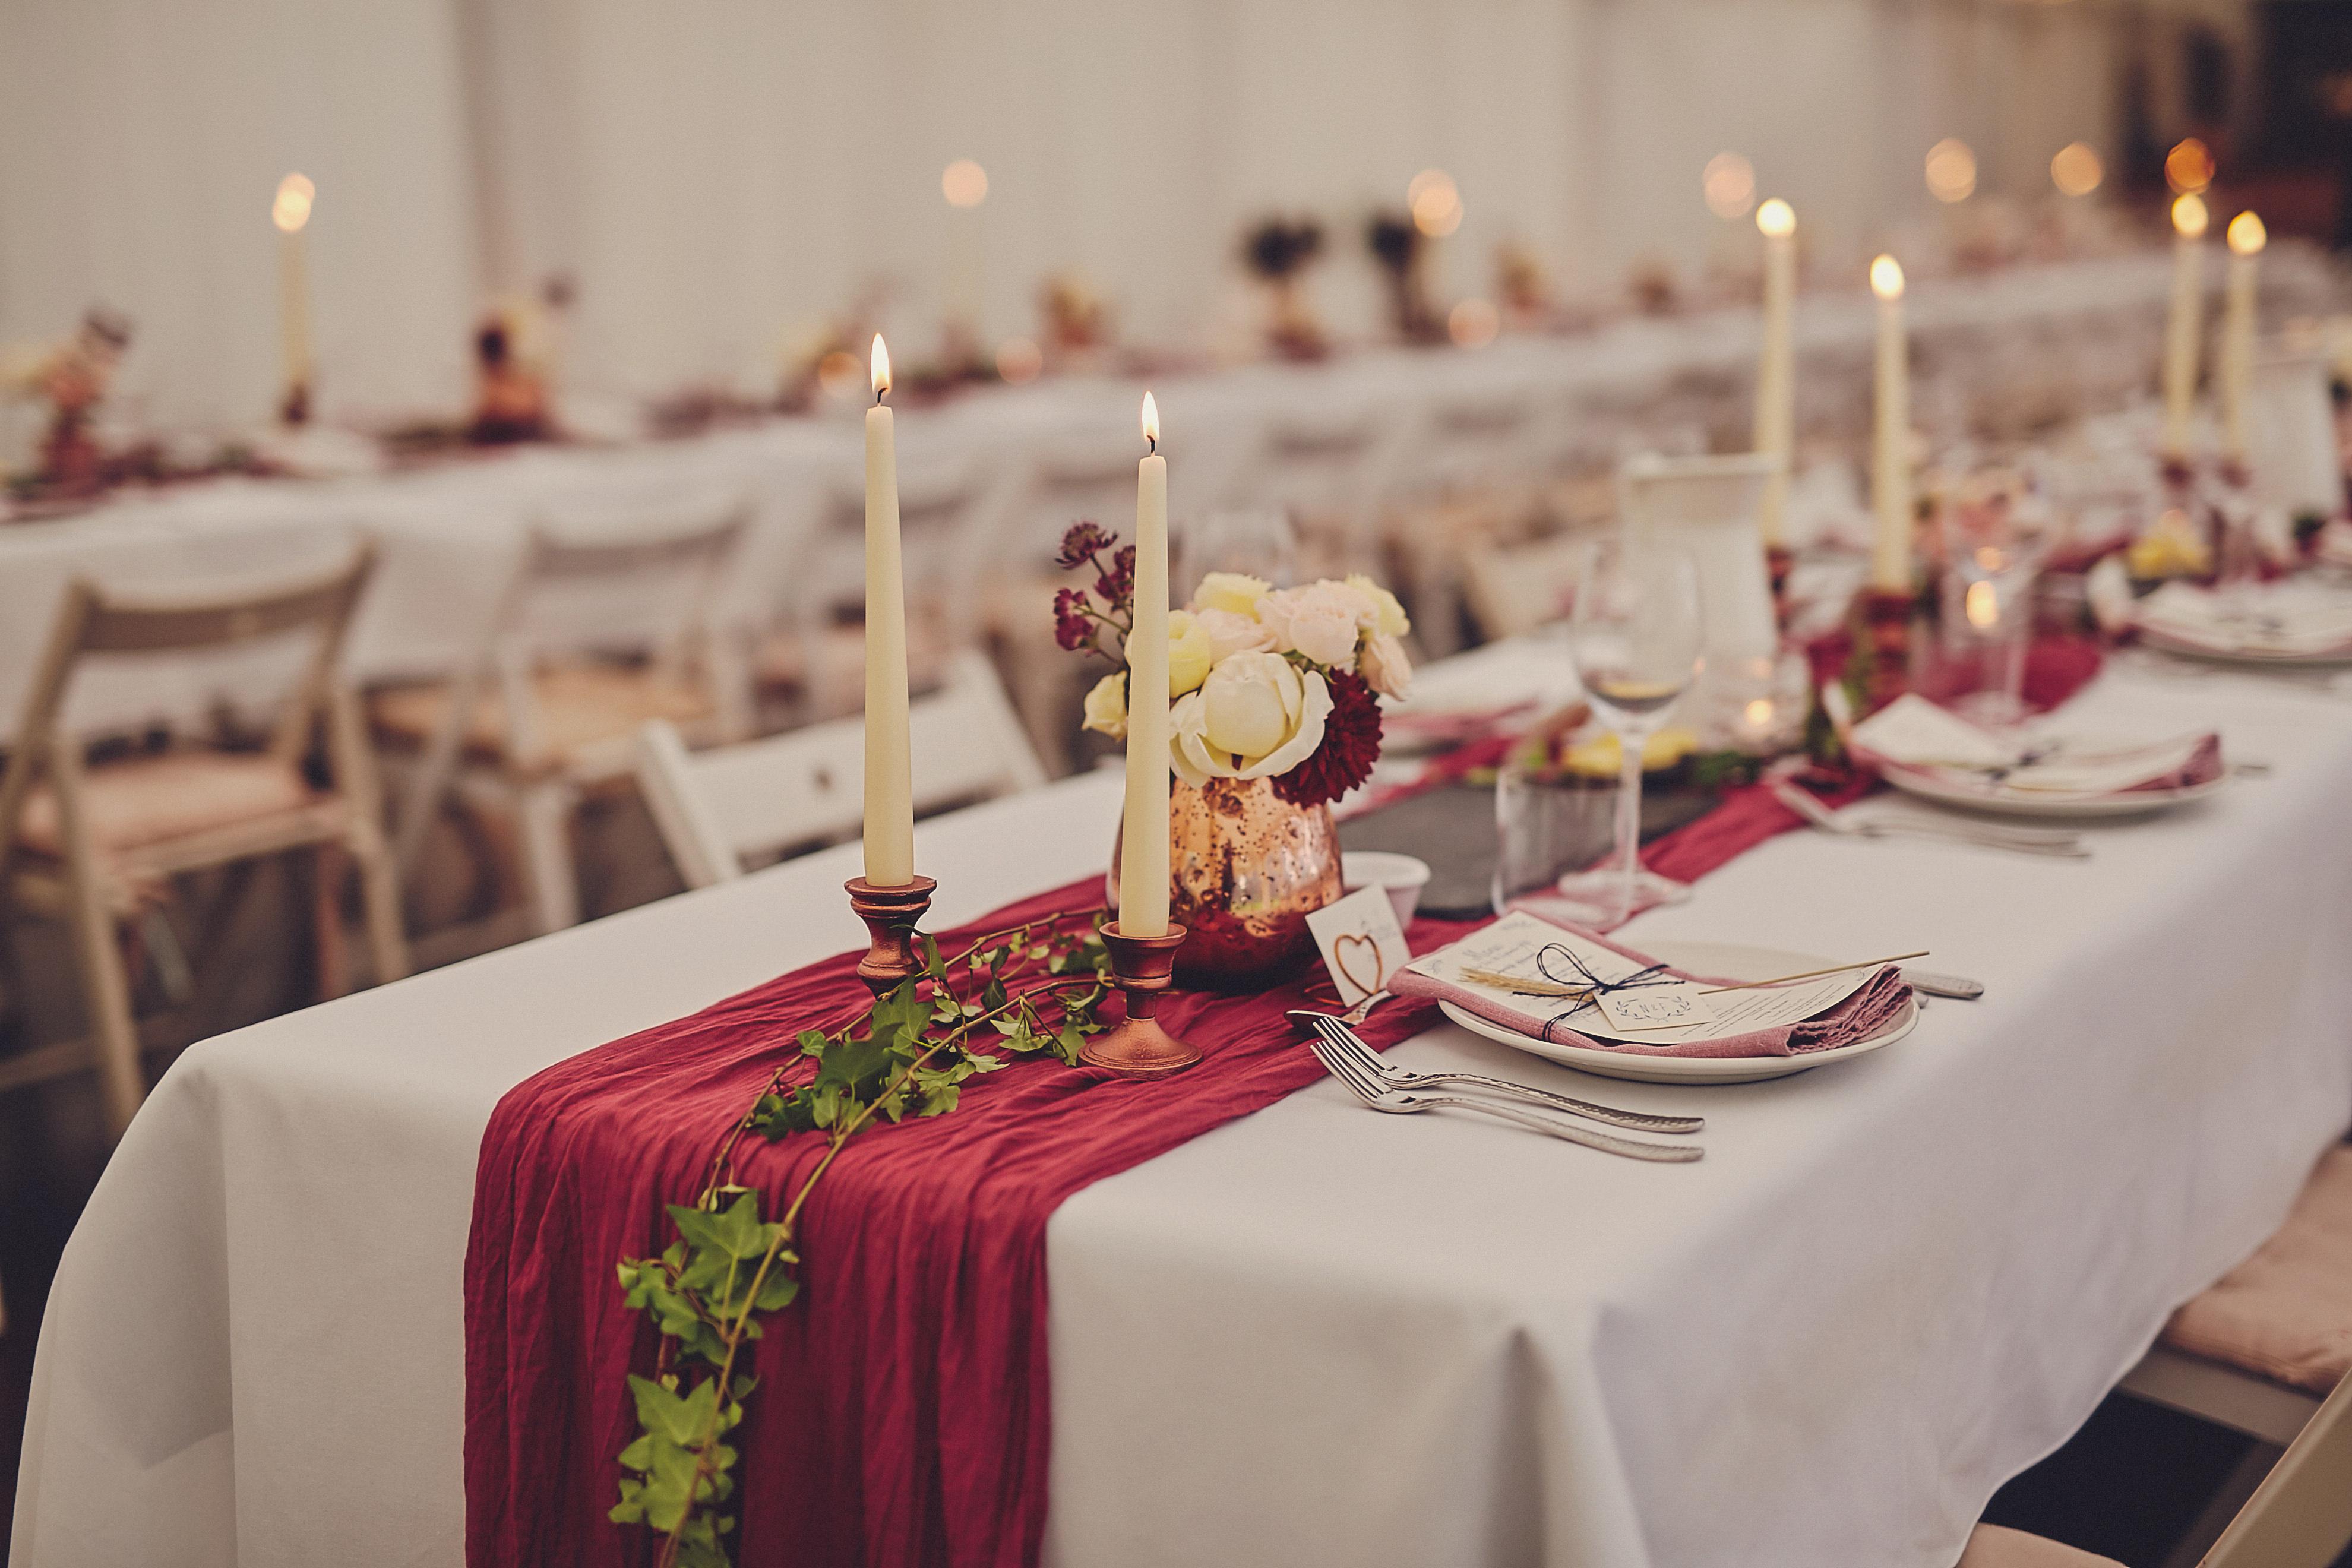 Cloughjordan House weddding123 1 - Cloughjordan House Wedding - Alternative Venue